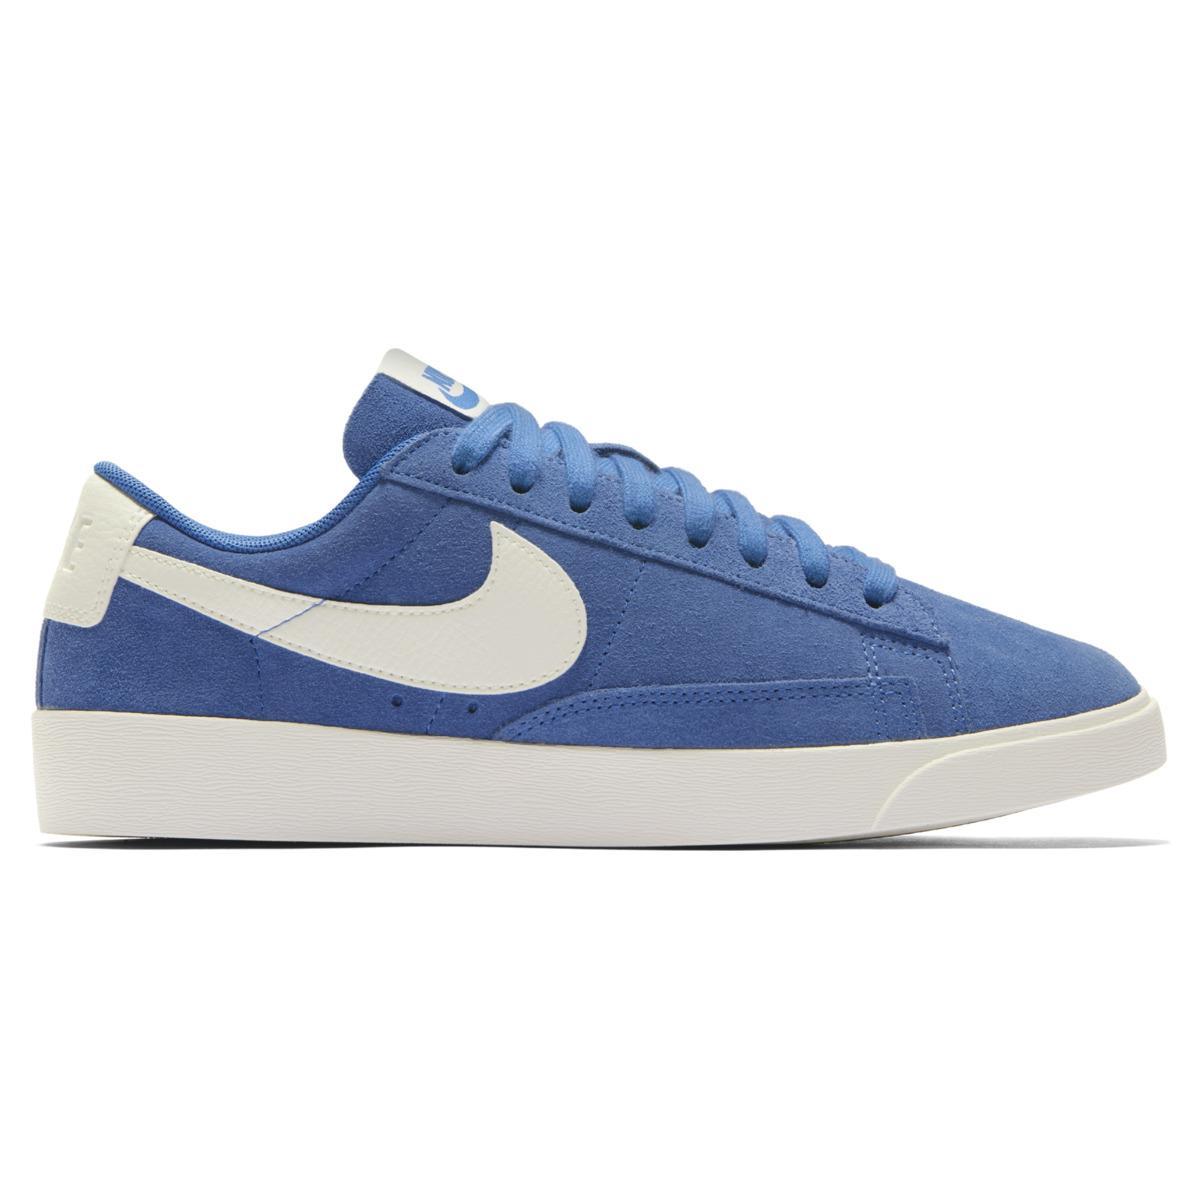 daeb9d0e37e33 Nike Blazer Low Suede Casual Trainers in Blue - Lyst